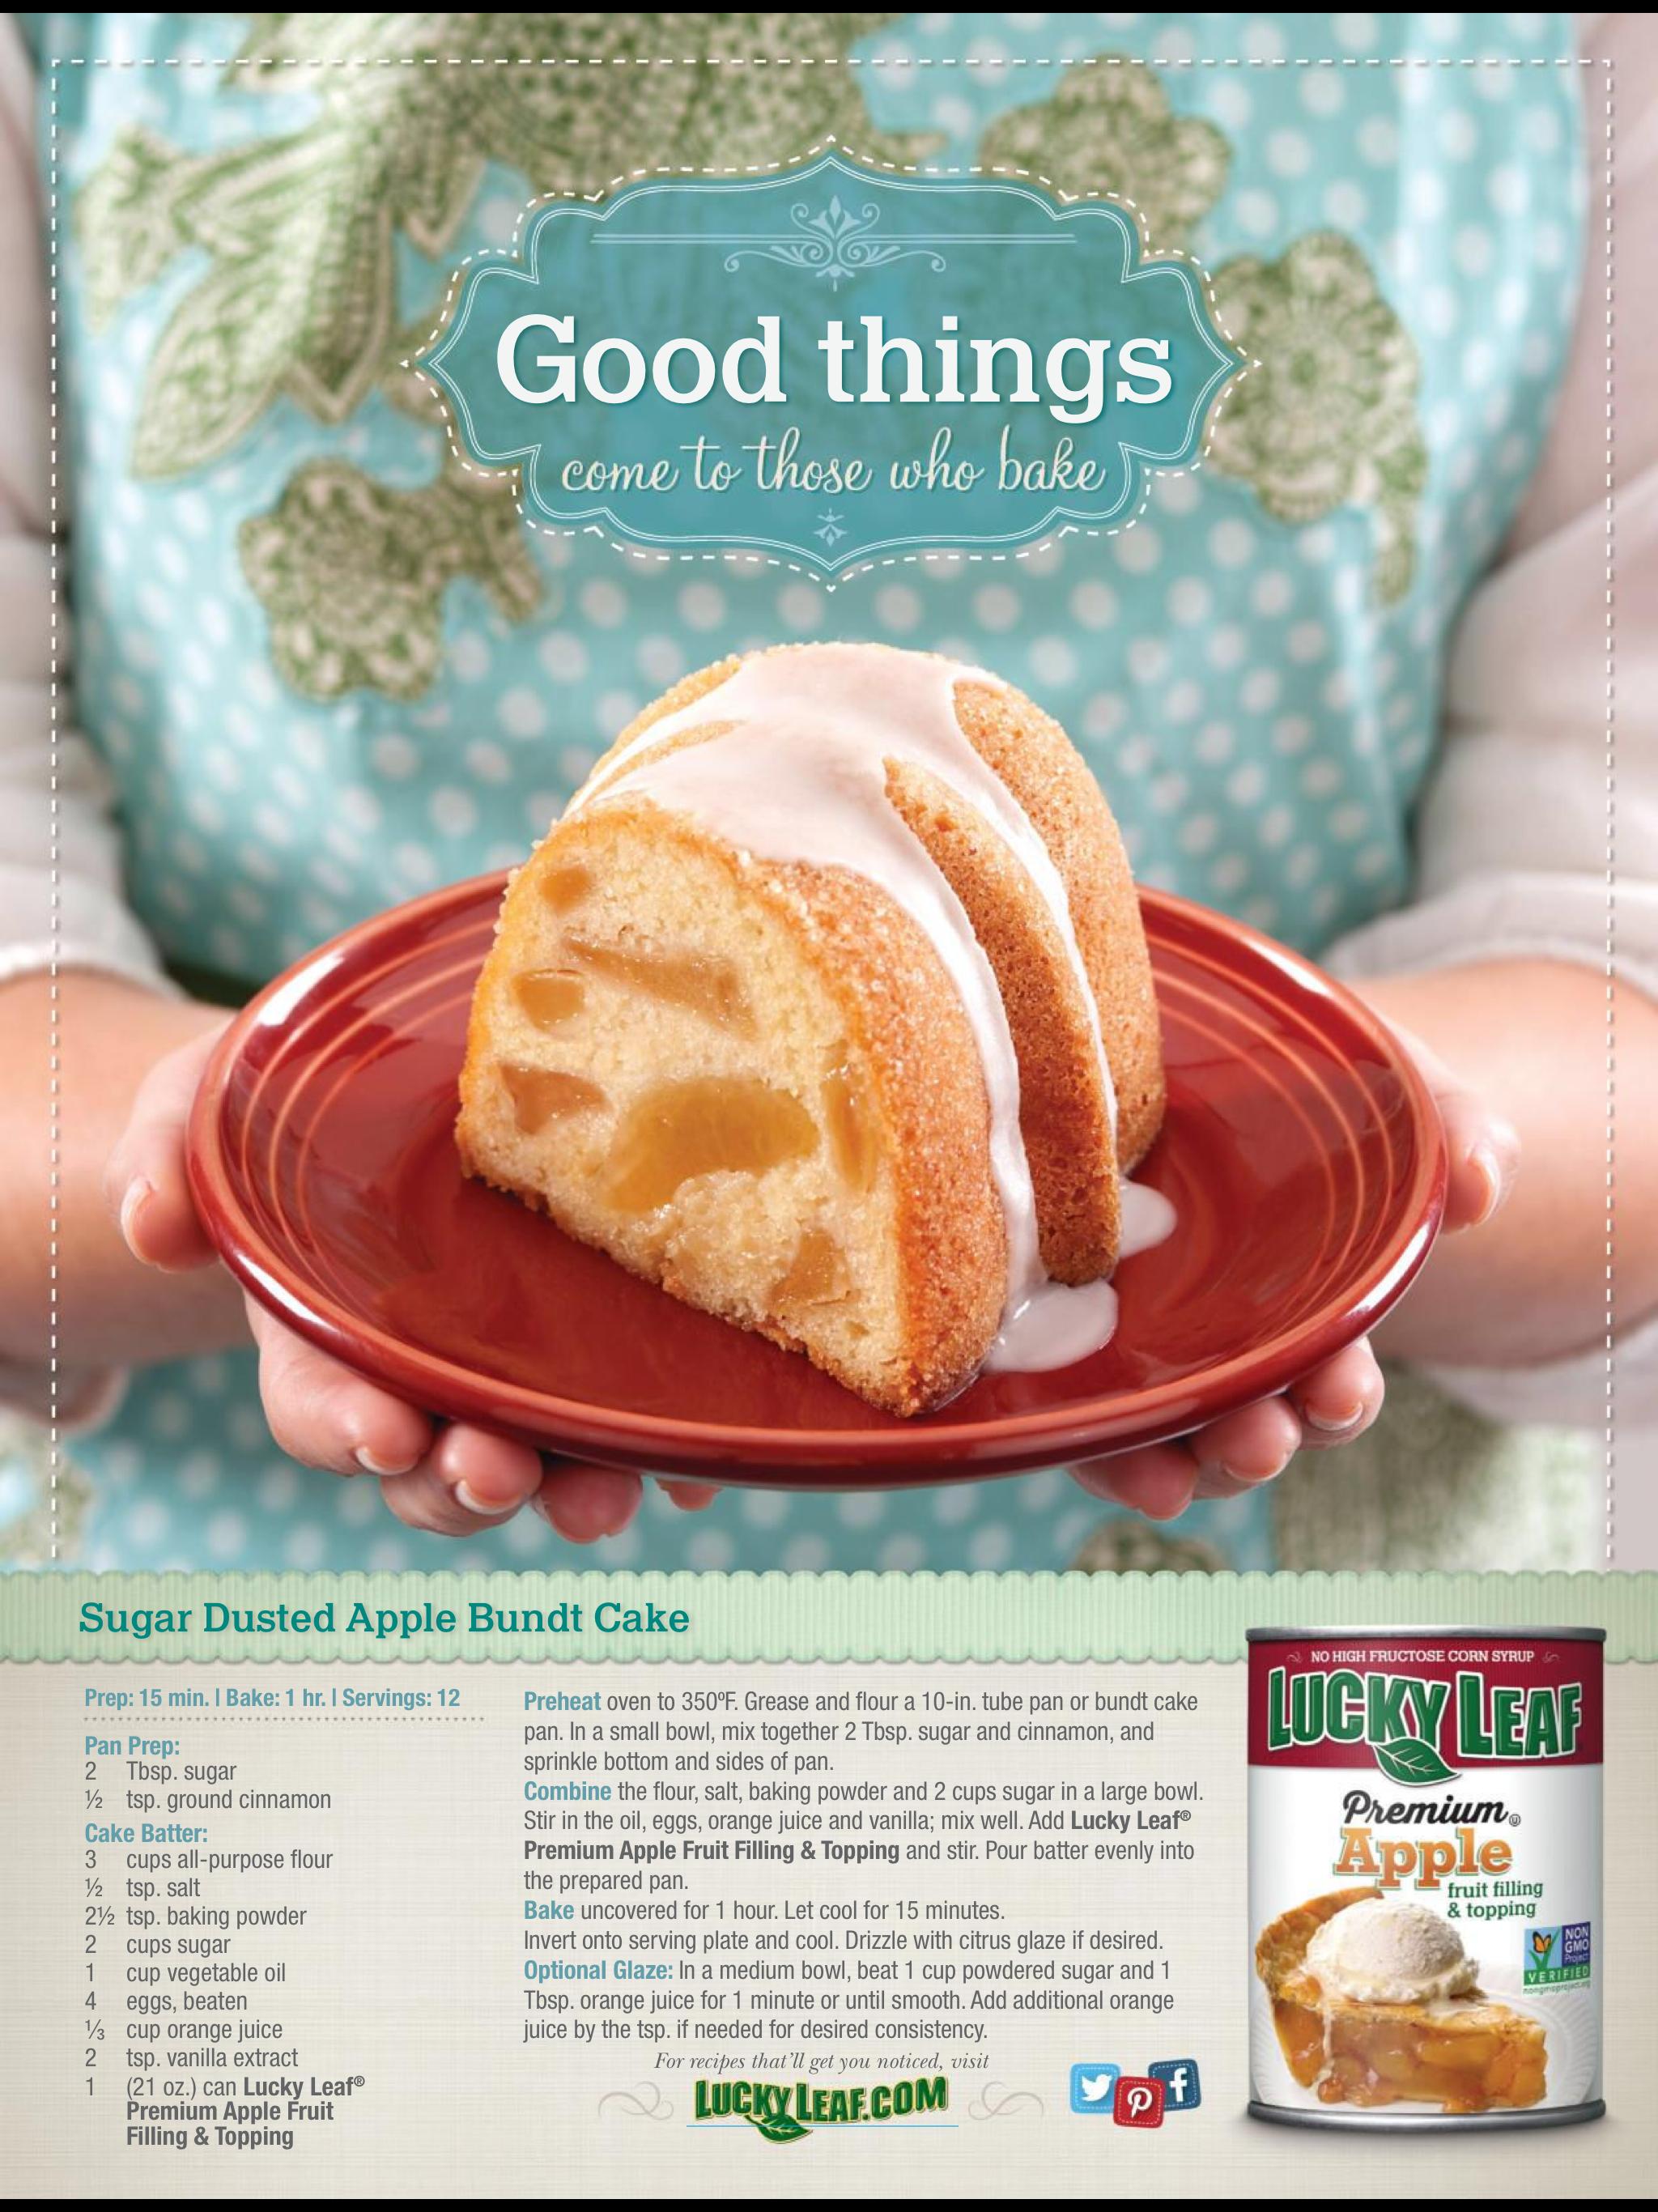 Apple bunds cake